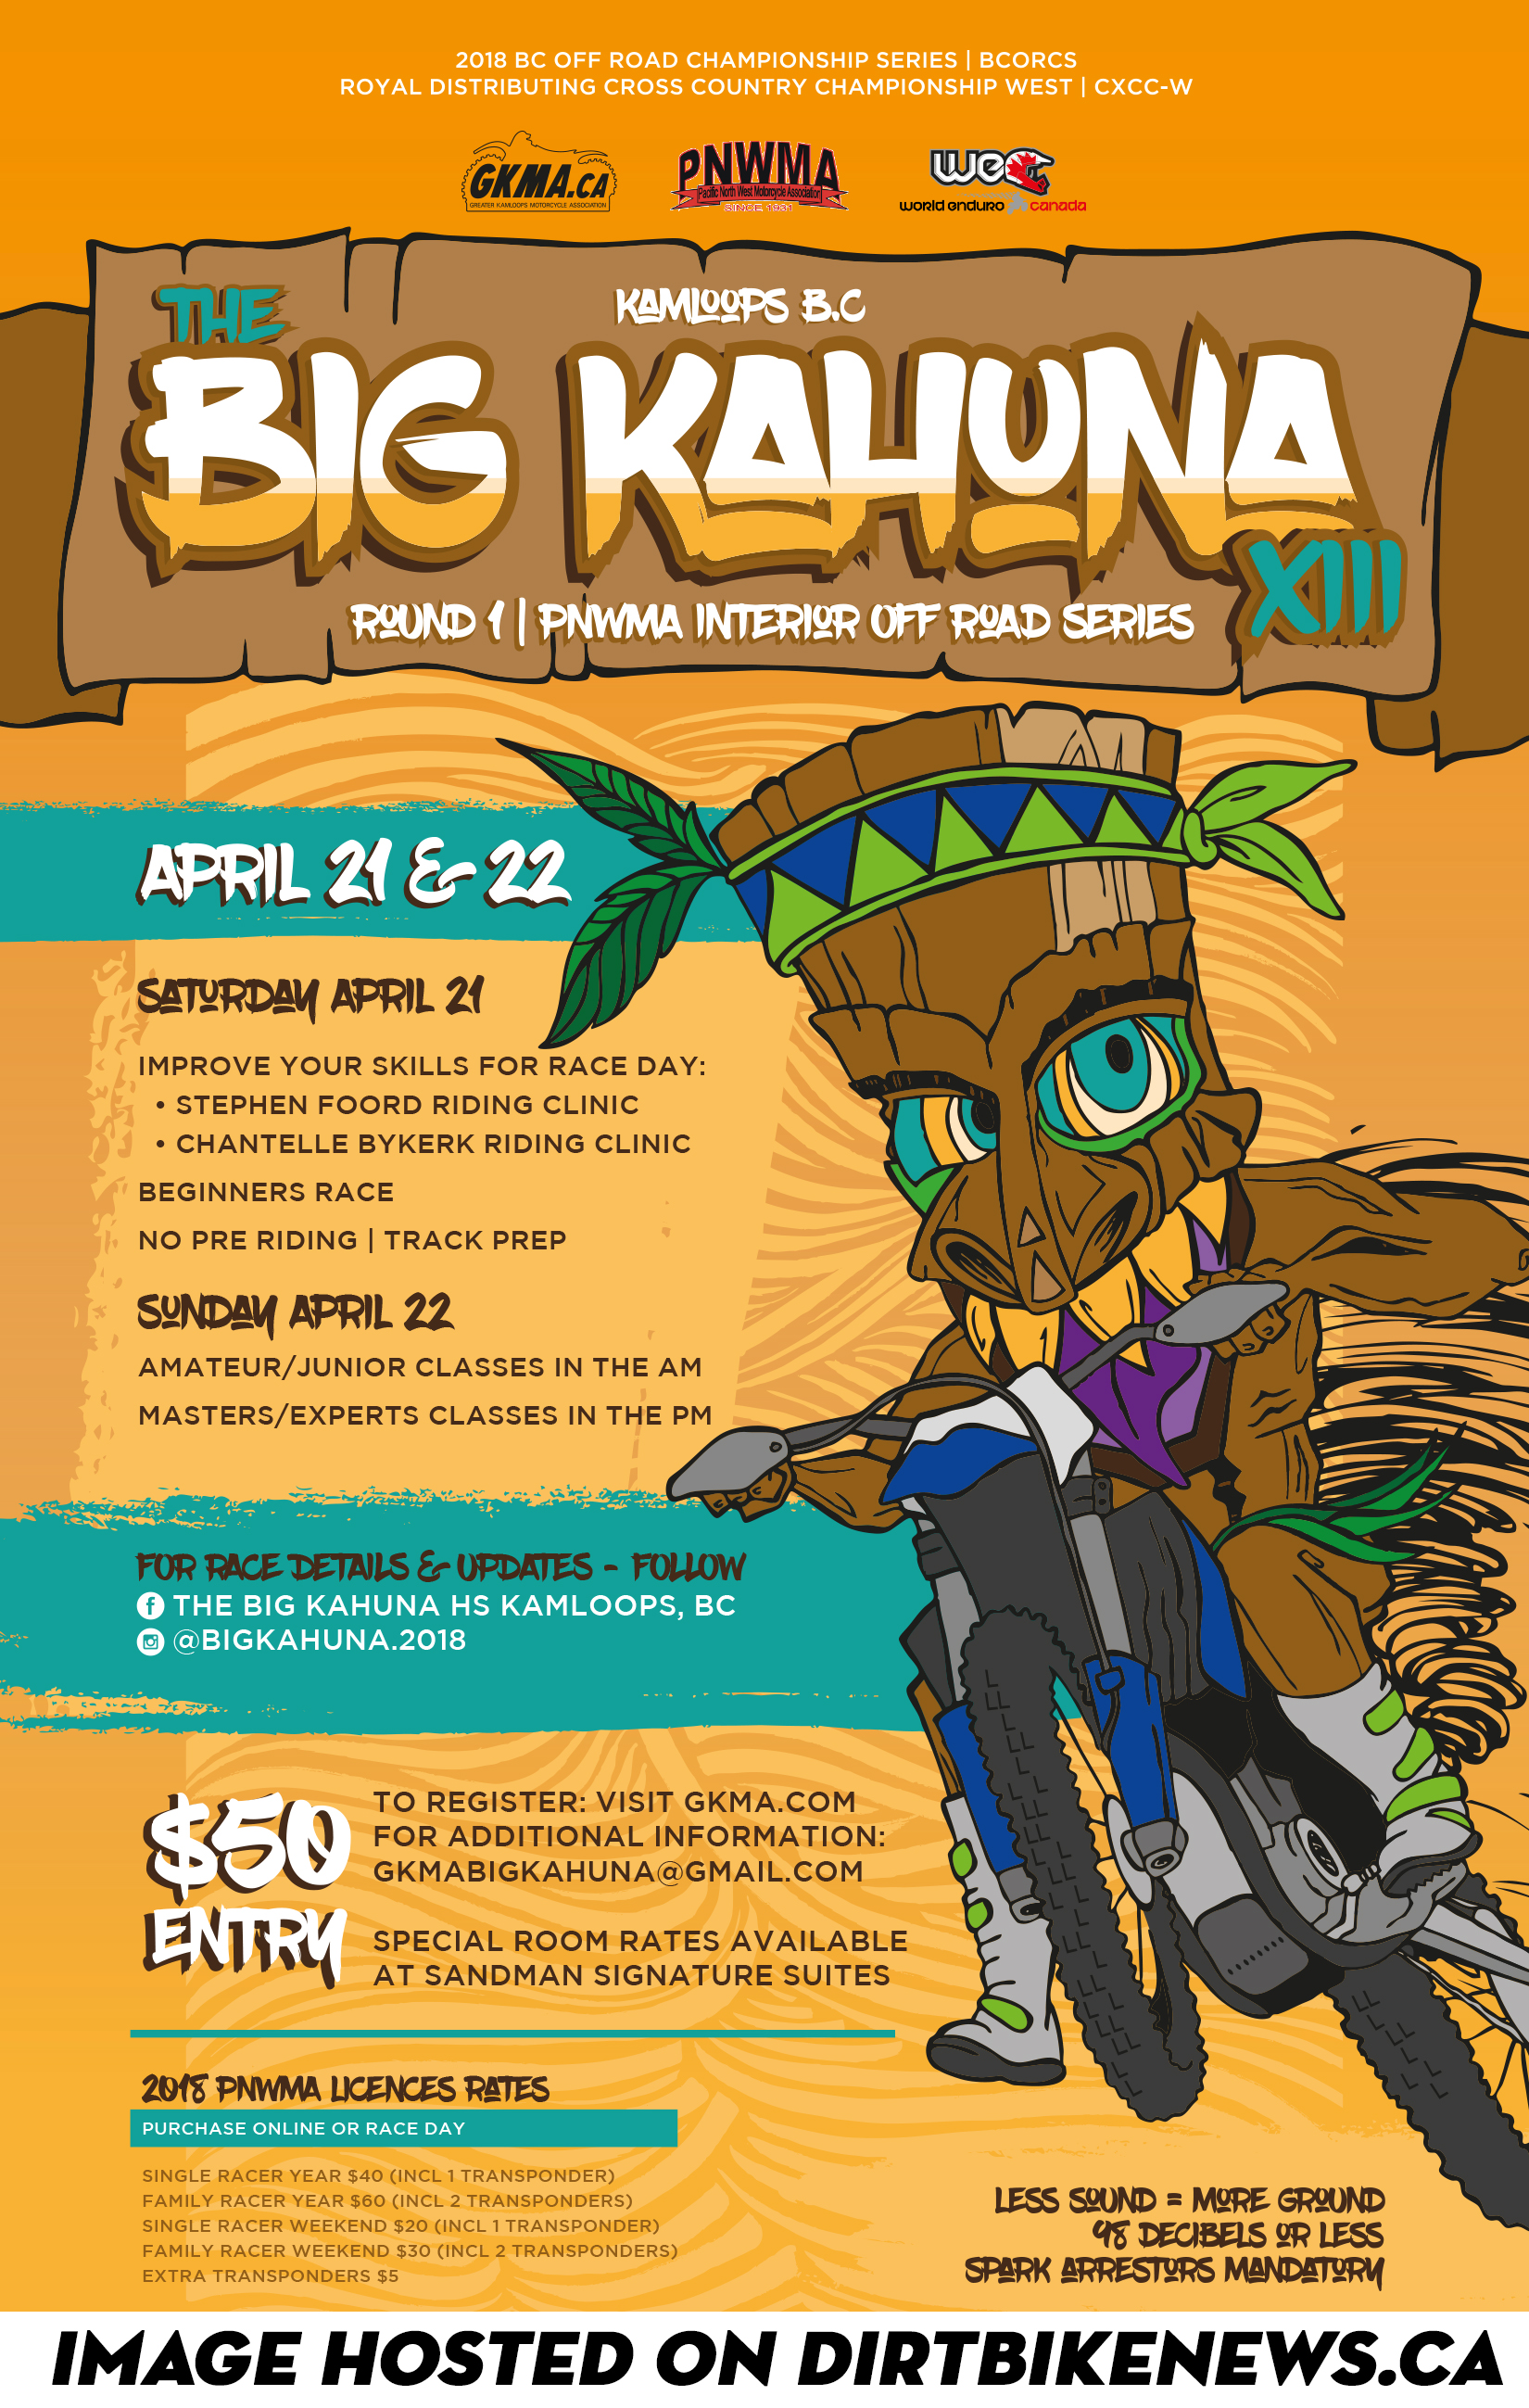 Big kahuna full size race poster